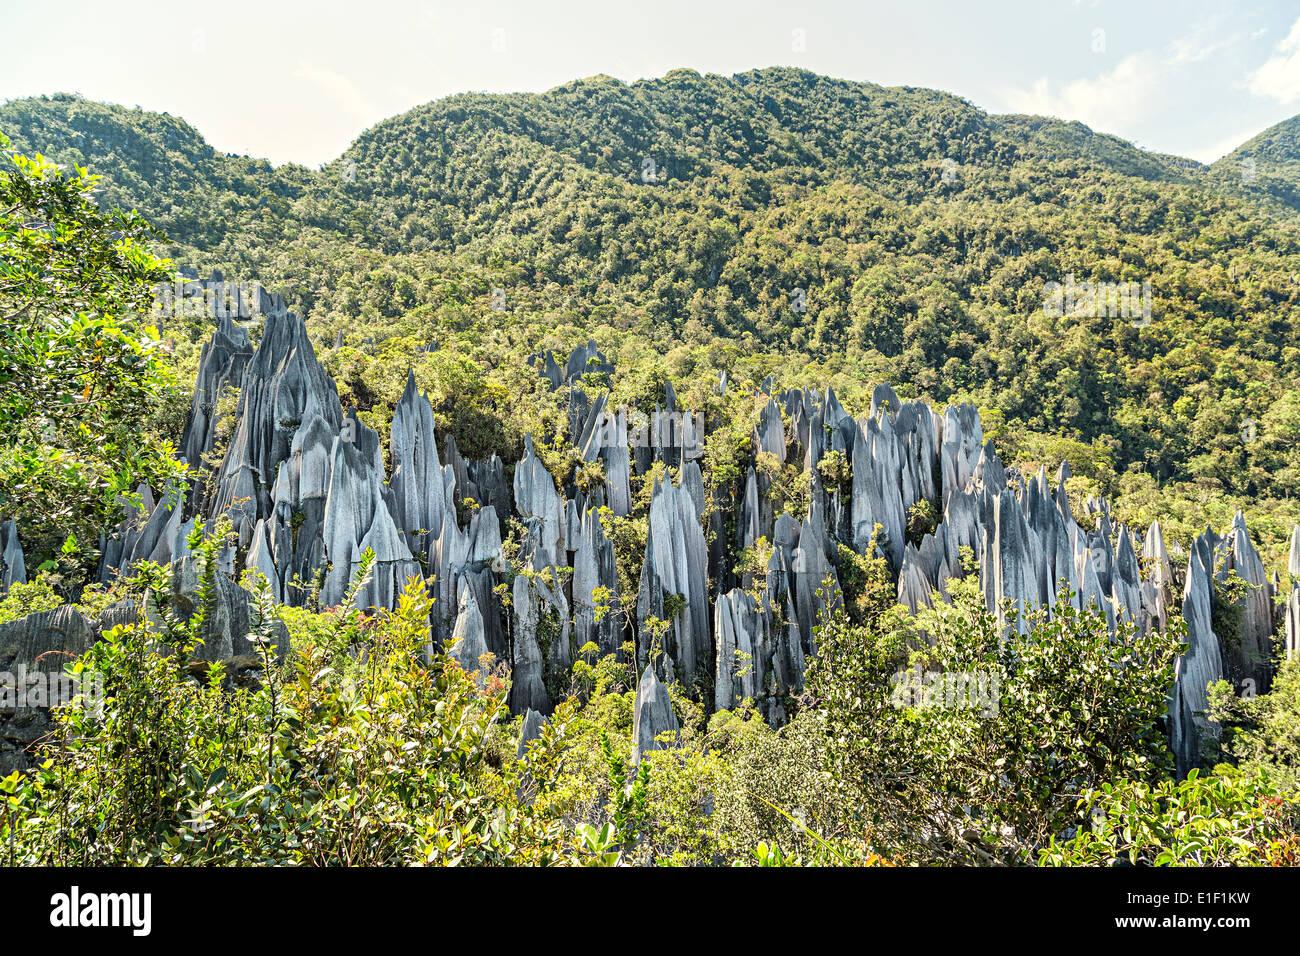 Pinnacles, karst landscape, Gunung Mulu national park, Sarawak, Malaysia Stock Photo